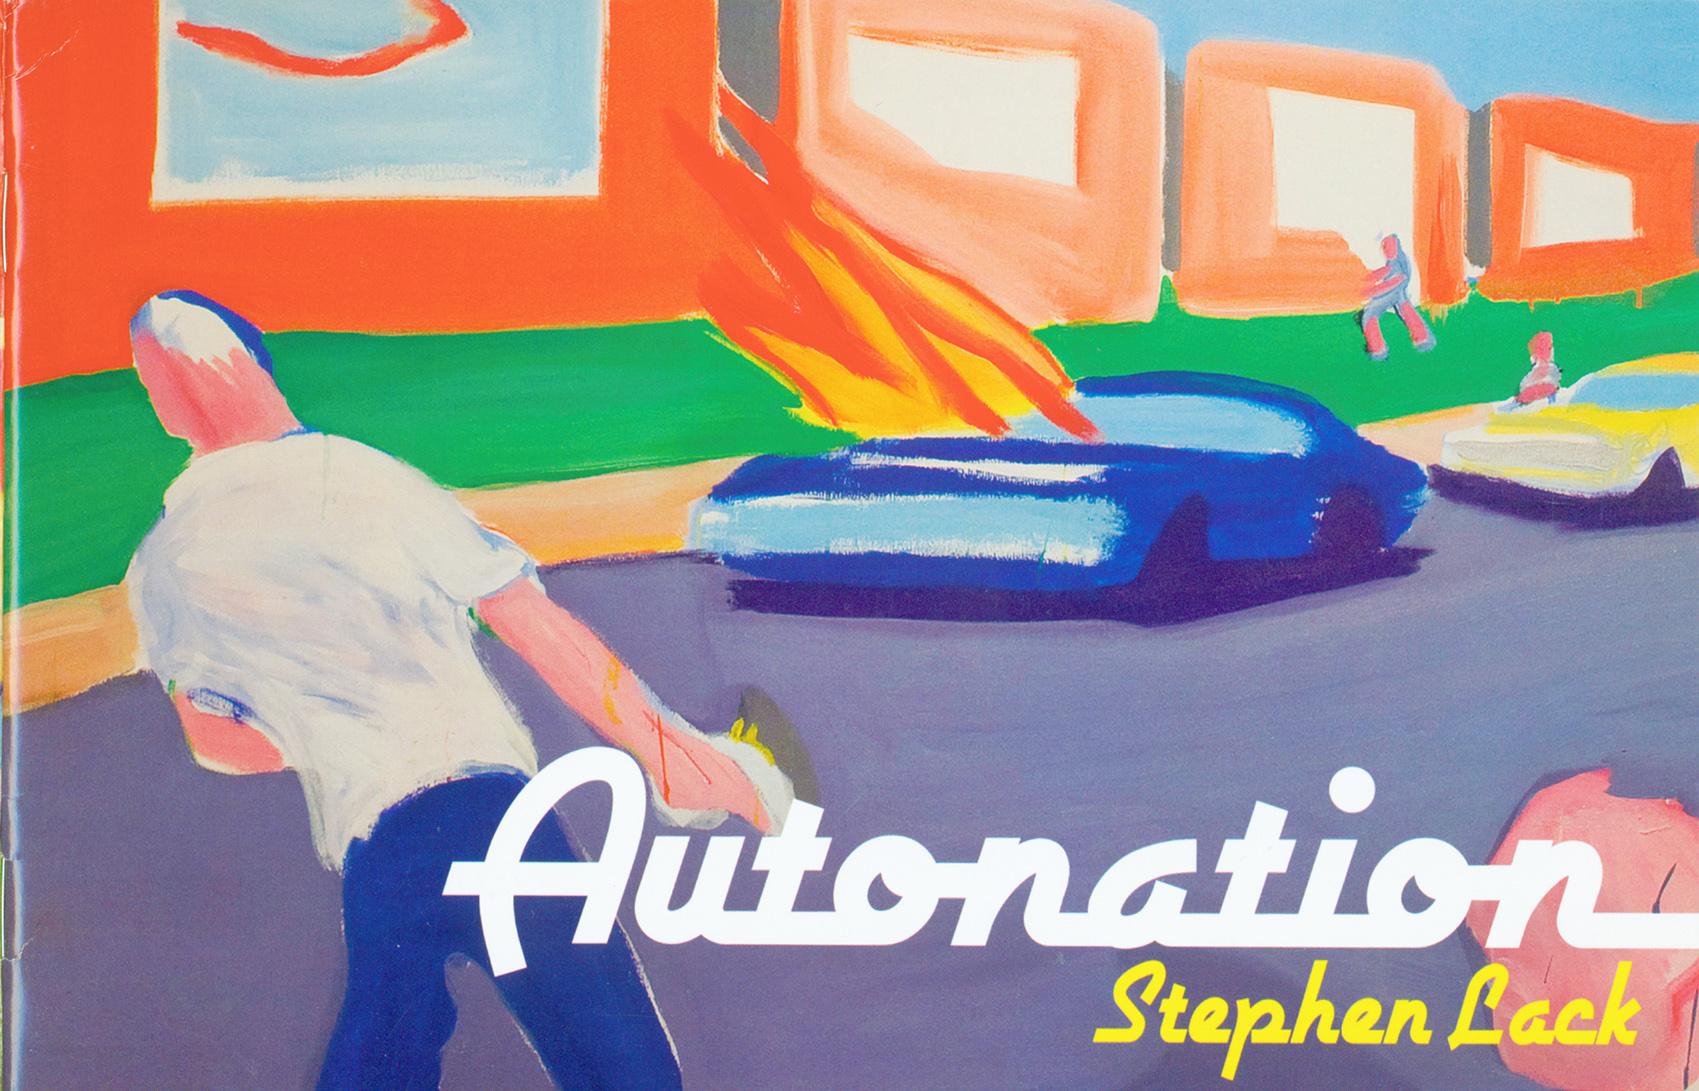 Lack-Stephen_Autonation_2010.jpg